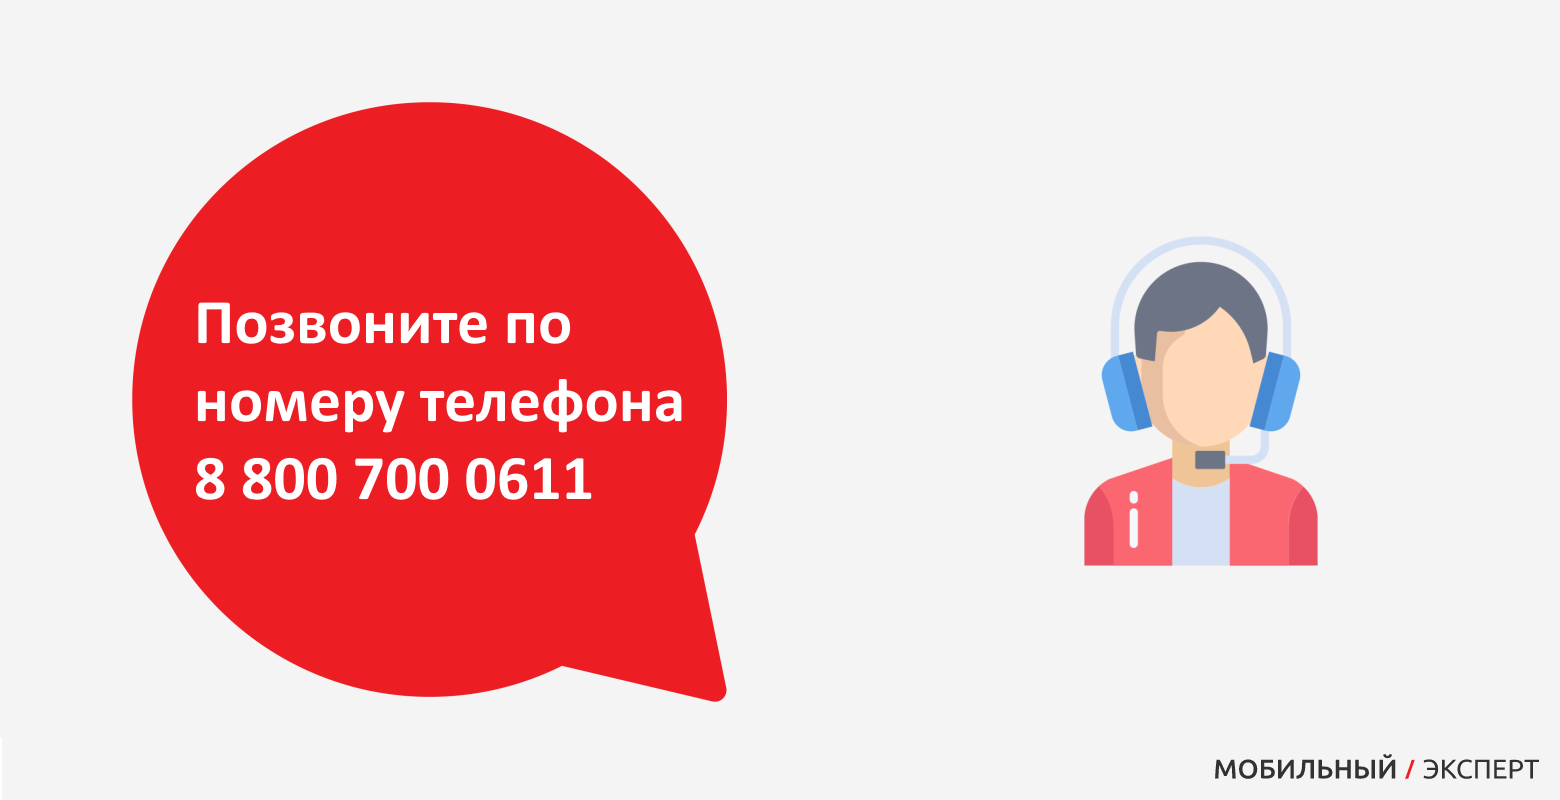 Позвоните по номеру телефона 8 800 700 0611